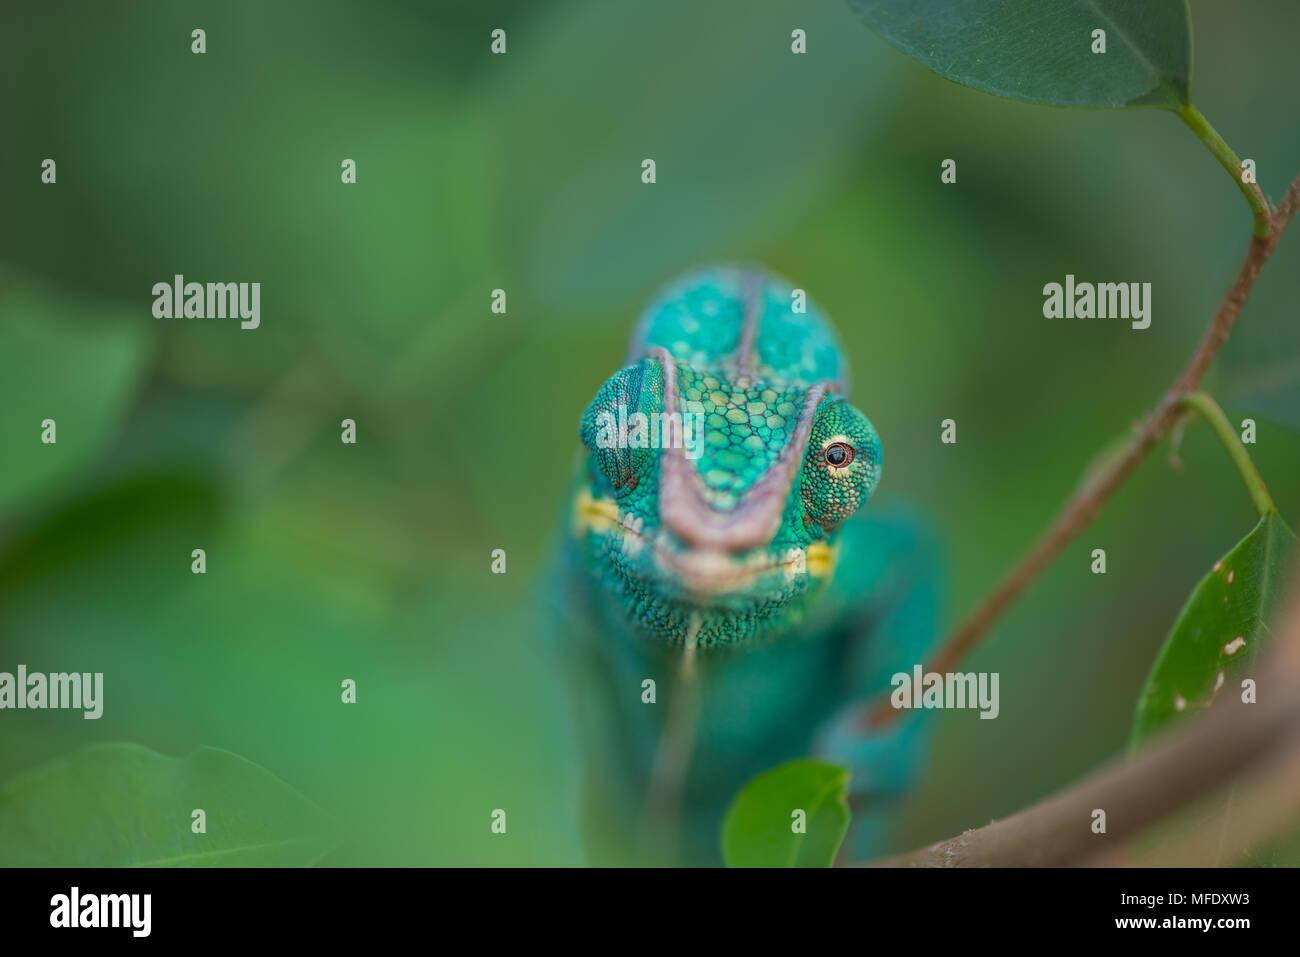 Panther chameleon con colori luminosi / Nosy be / Madagascar wildlife / Furcifer pardalis / Blu chameleon Immagini Stock